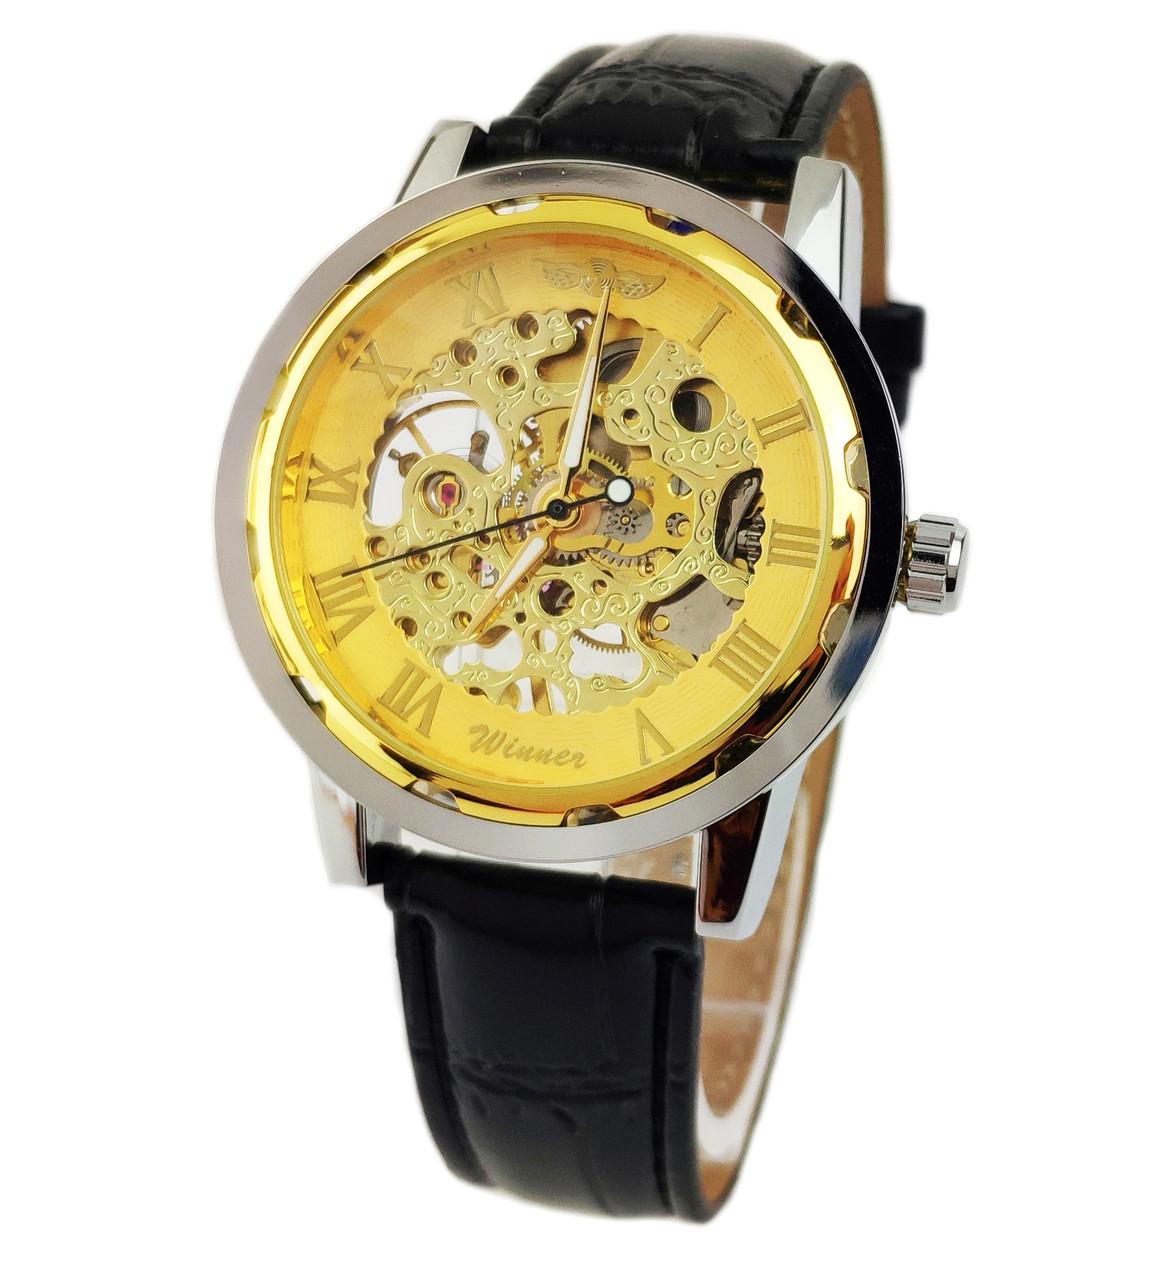 Механические часы Winner Skeleton Simple Golden - гарантия 12 месяцев